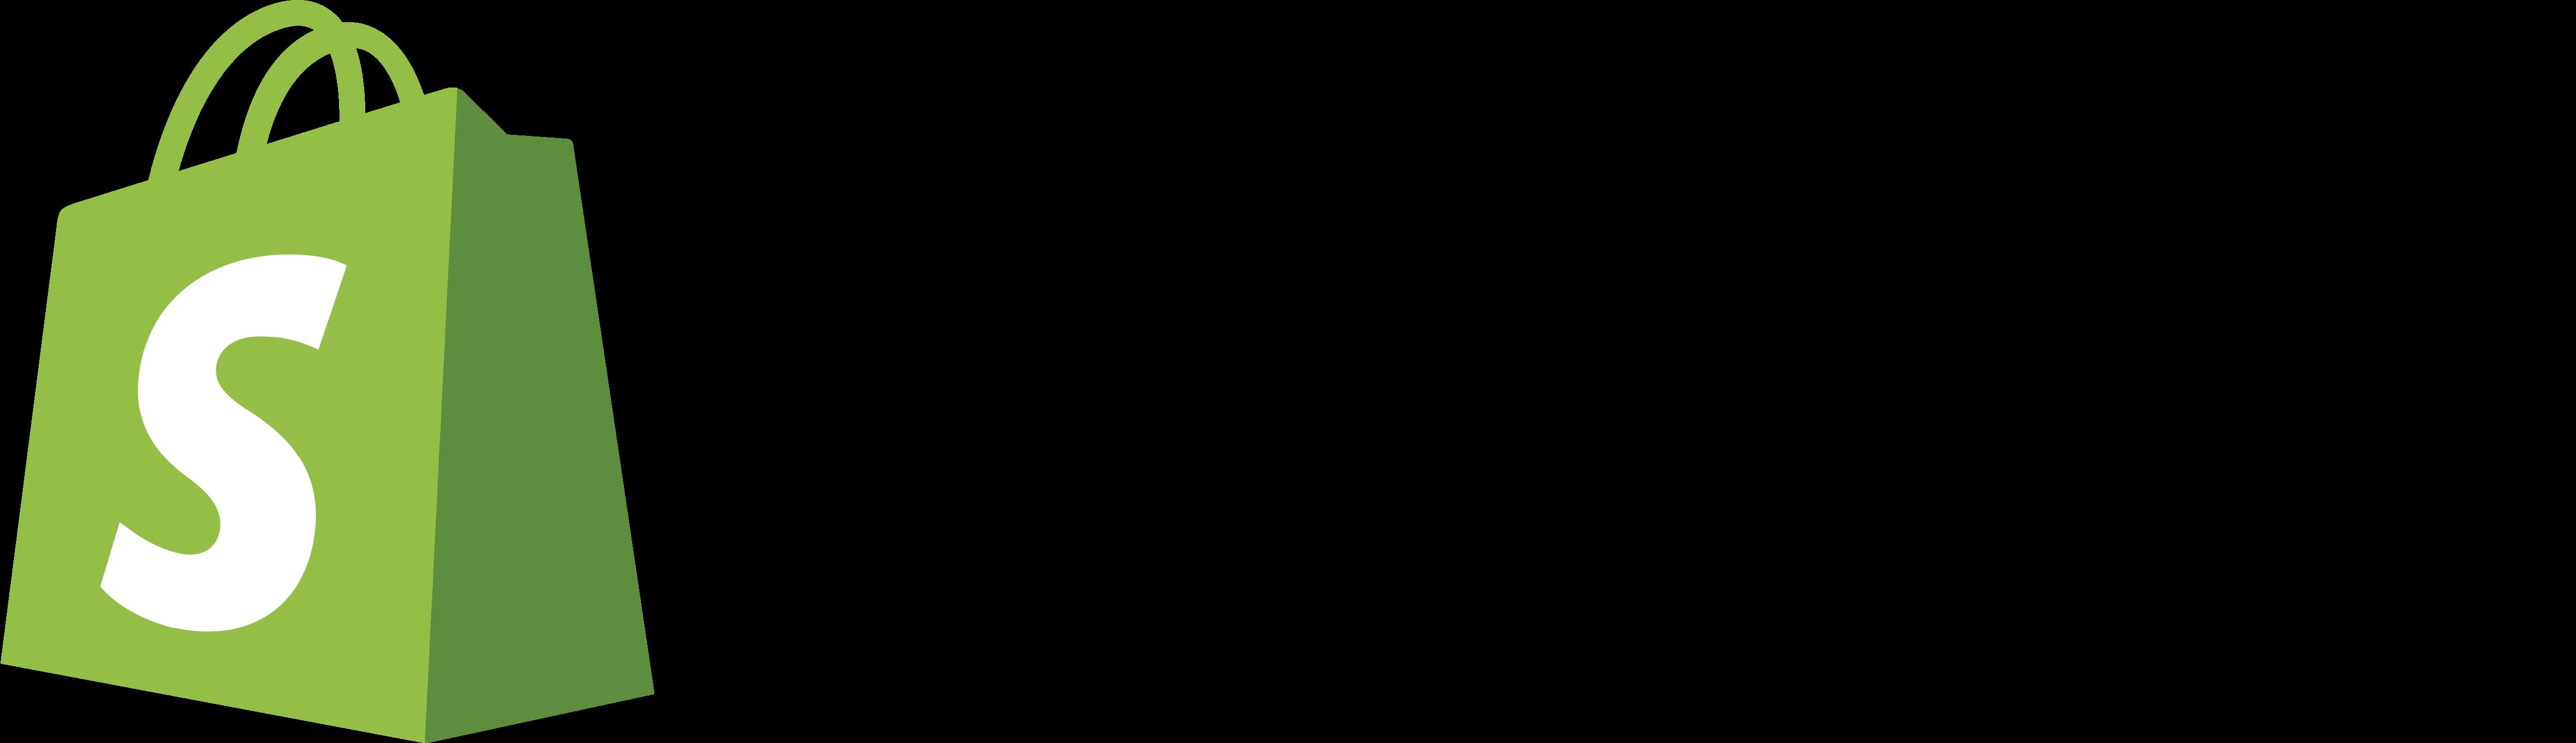 Shopify_logo_wordmark